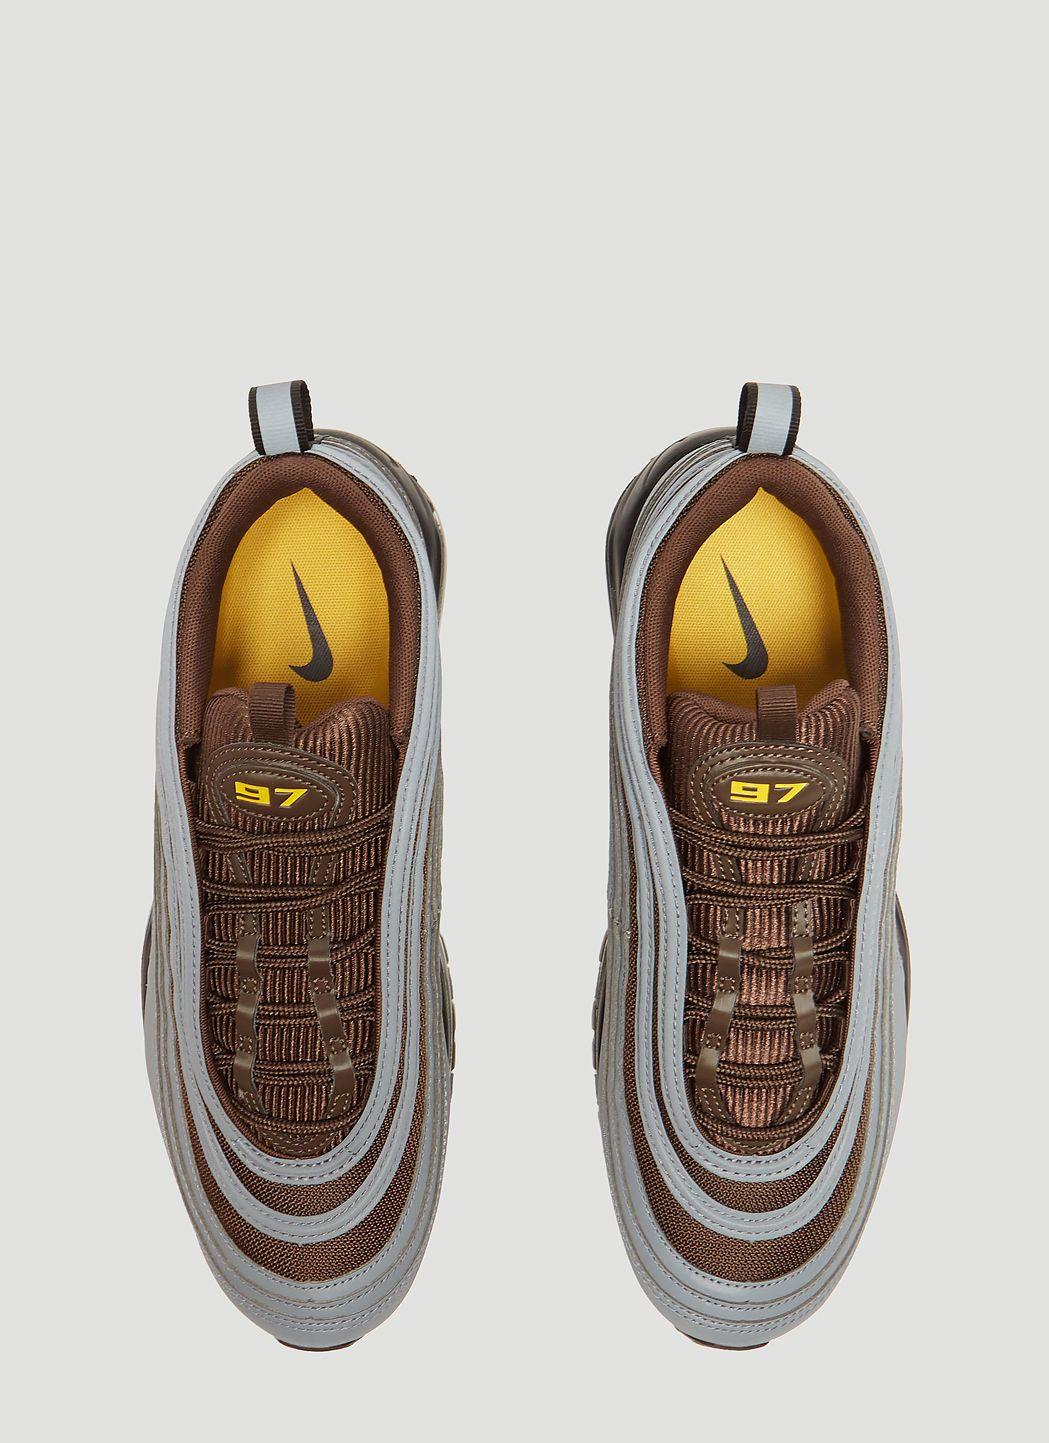 buy popular 184a3 da383 Nike Air Max 97 3M Sneakers in Black   LN-CC